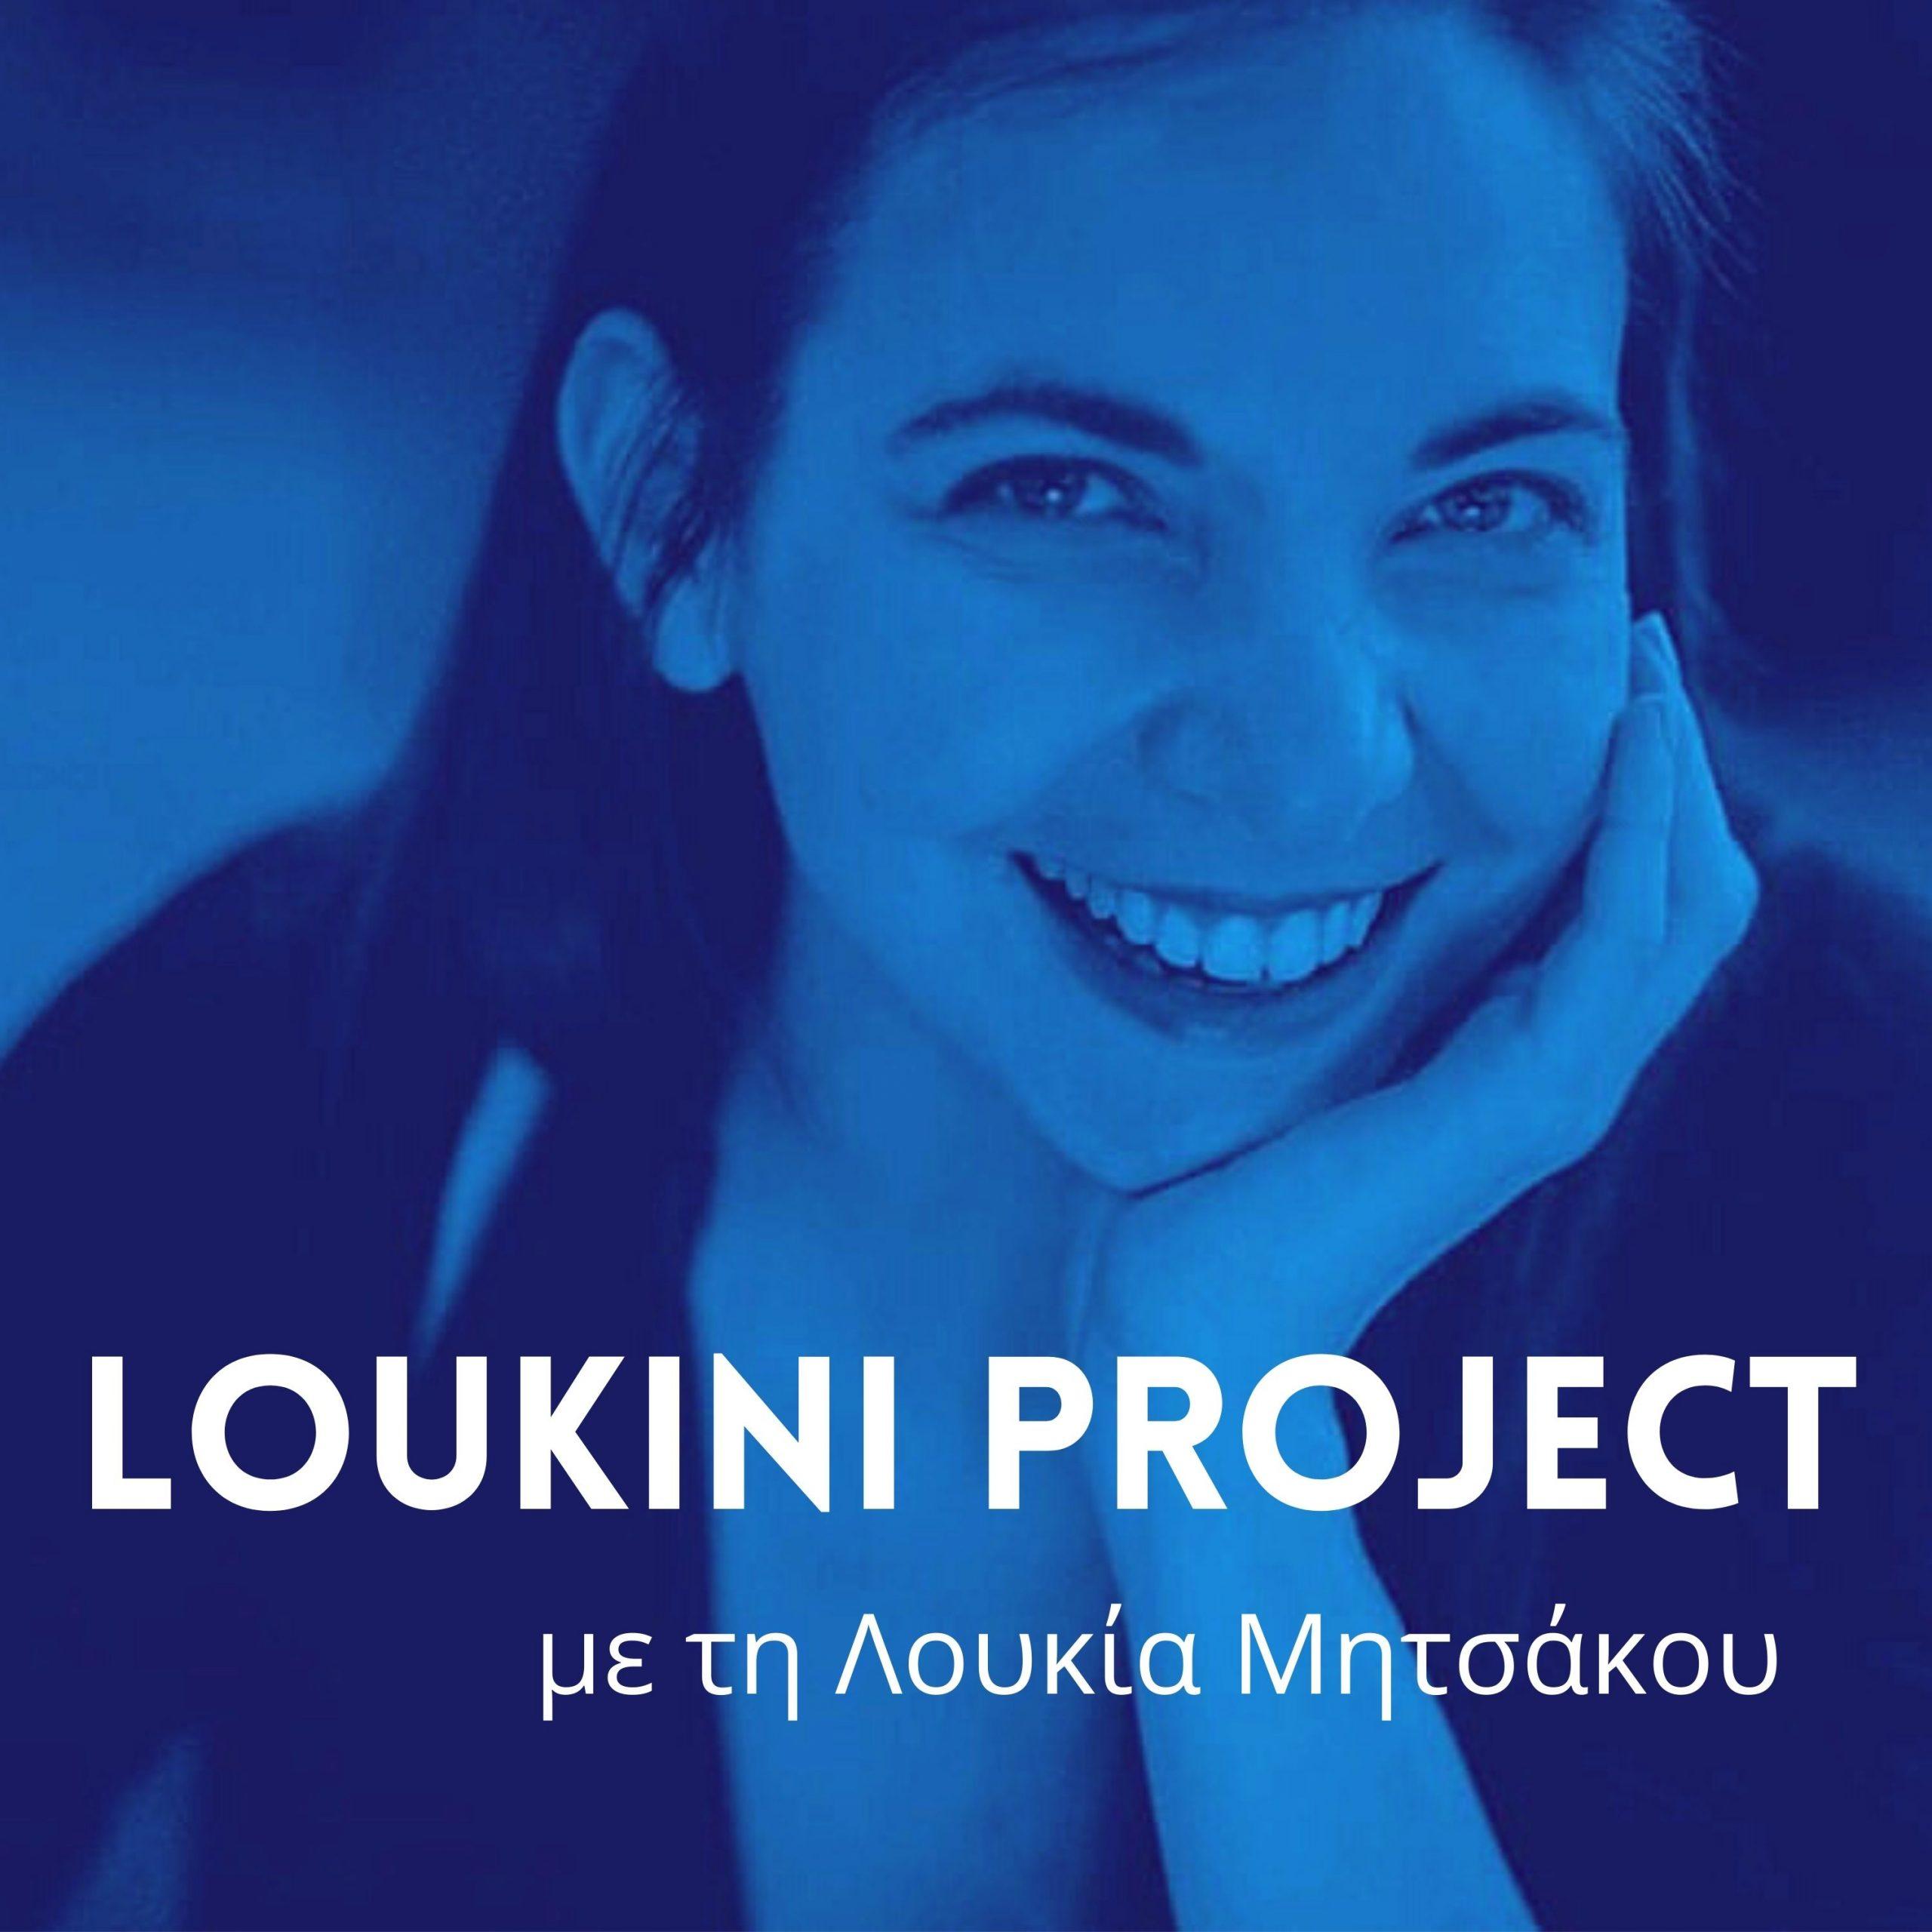 Loukini Project Podcast